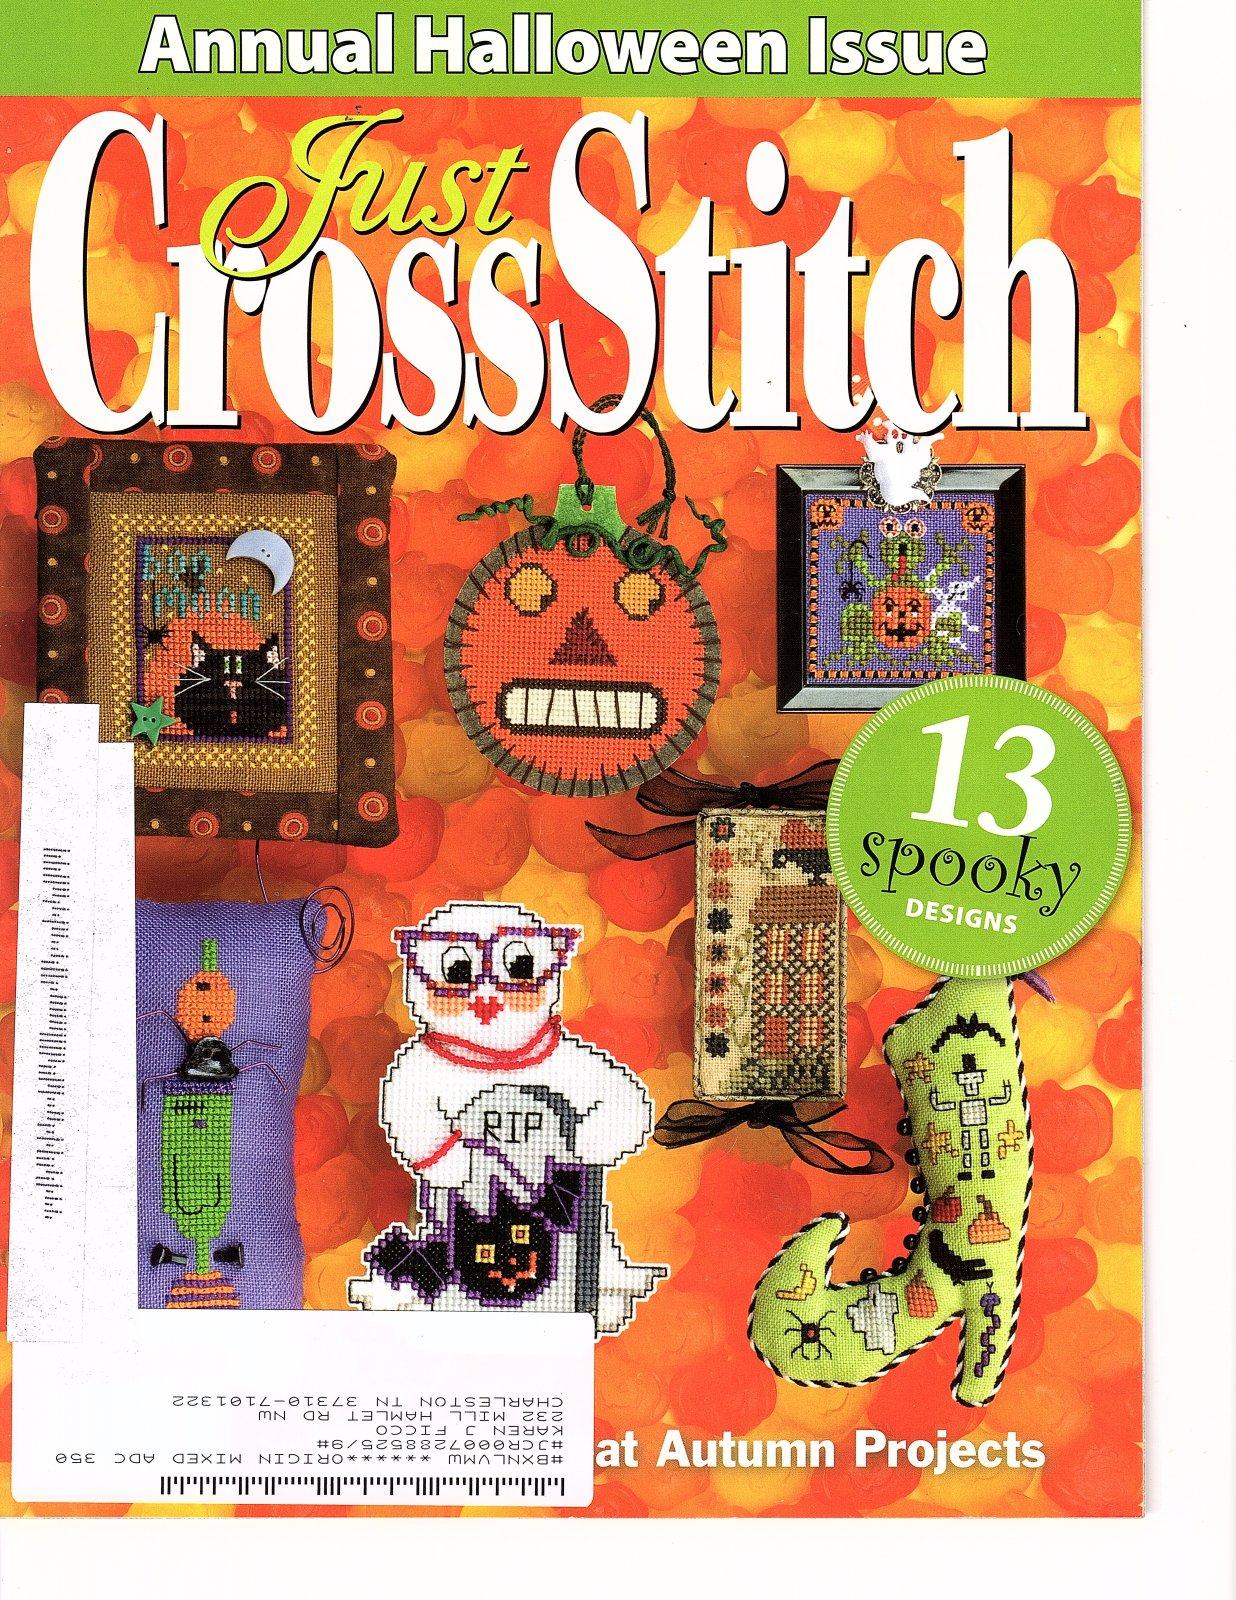 Just CrossStitch - America's Premier Cross-Stitch Magazine - Sept/Oct 2009